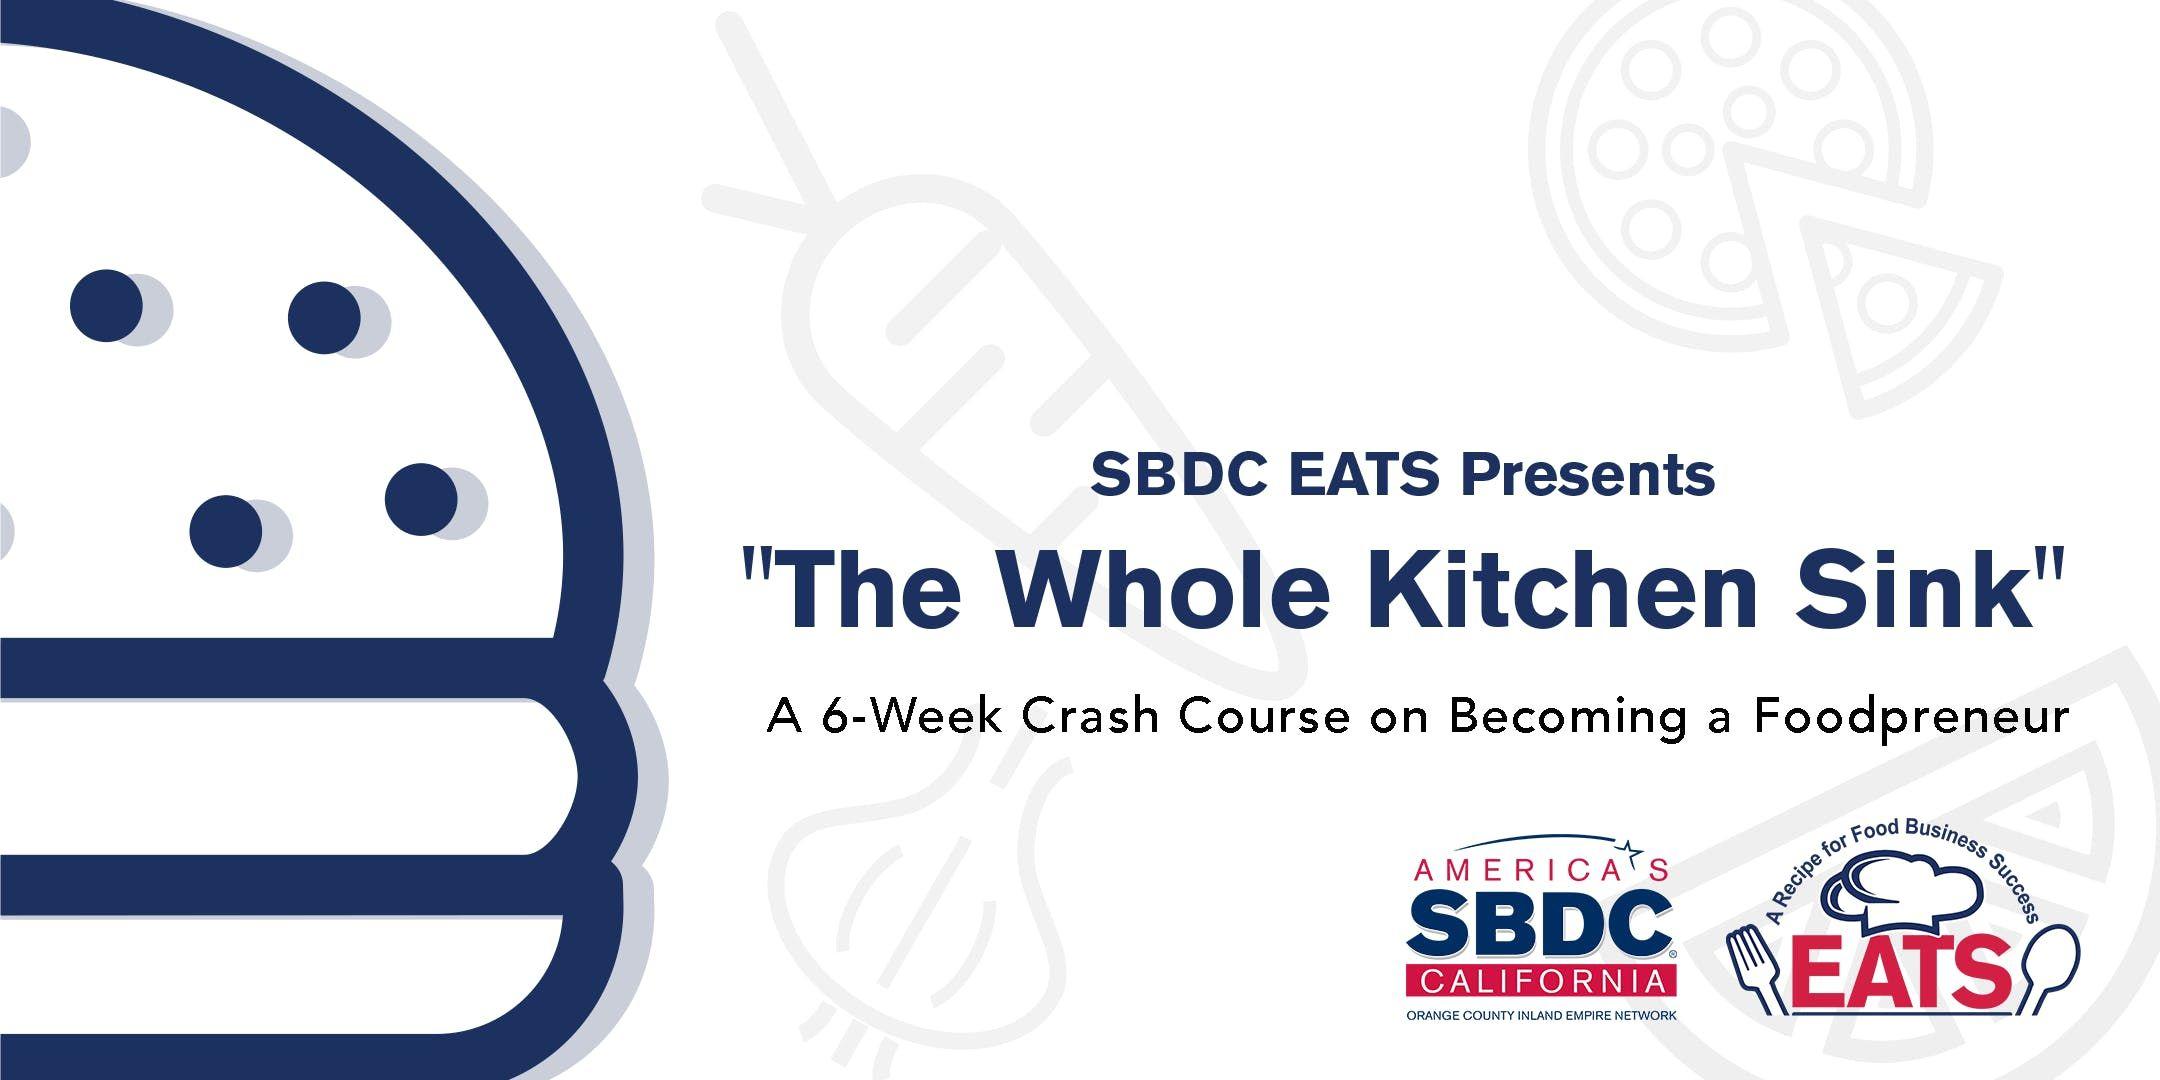 SBDC EATS Presents \